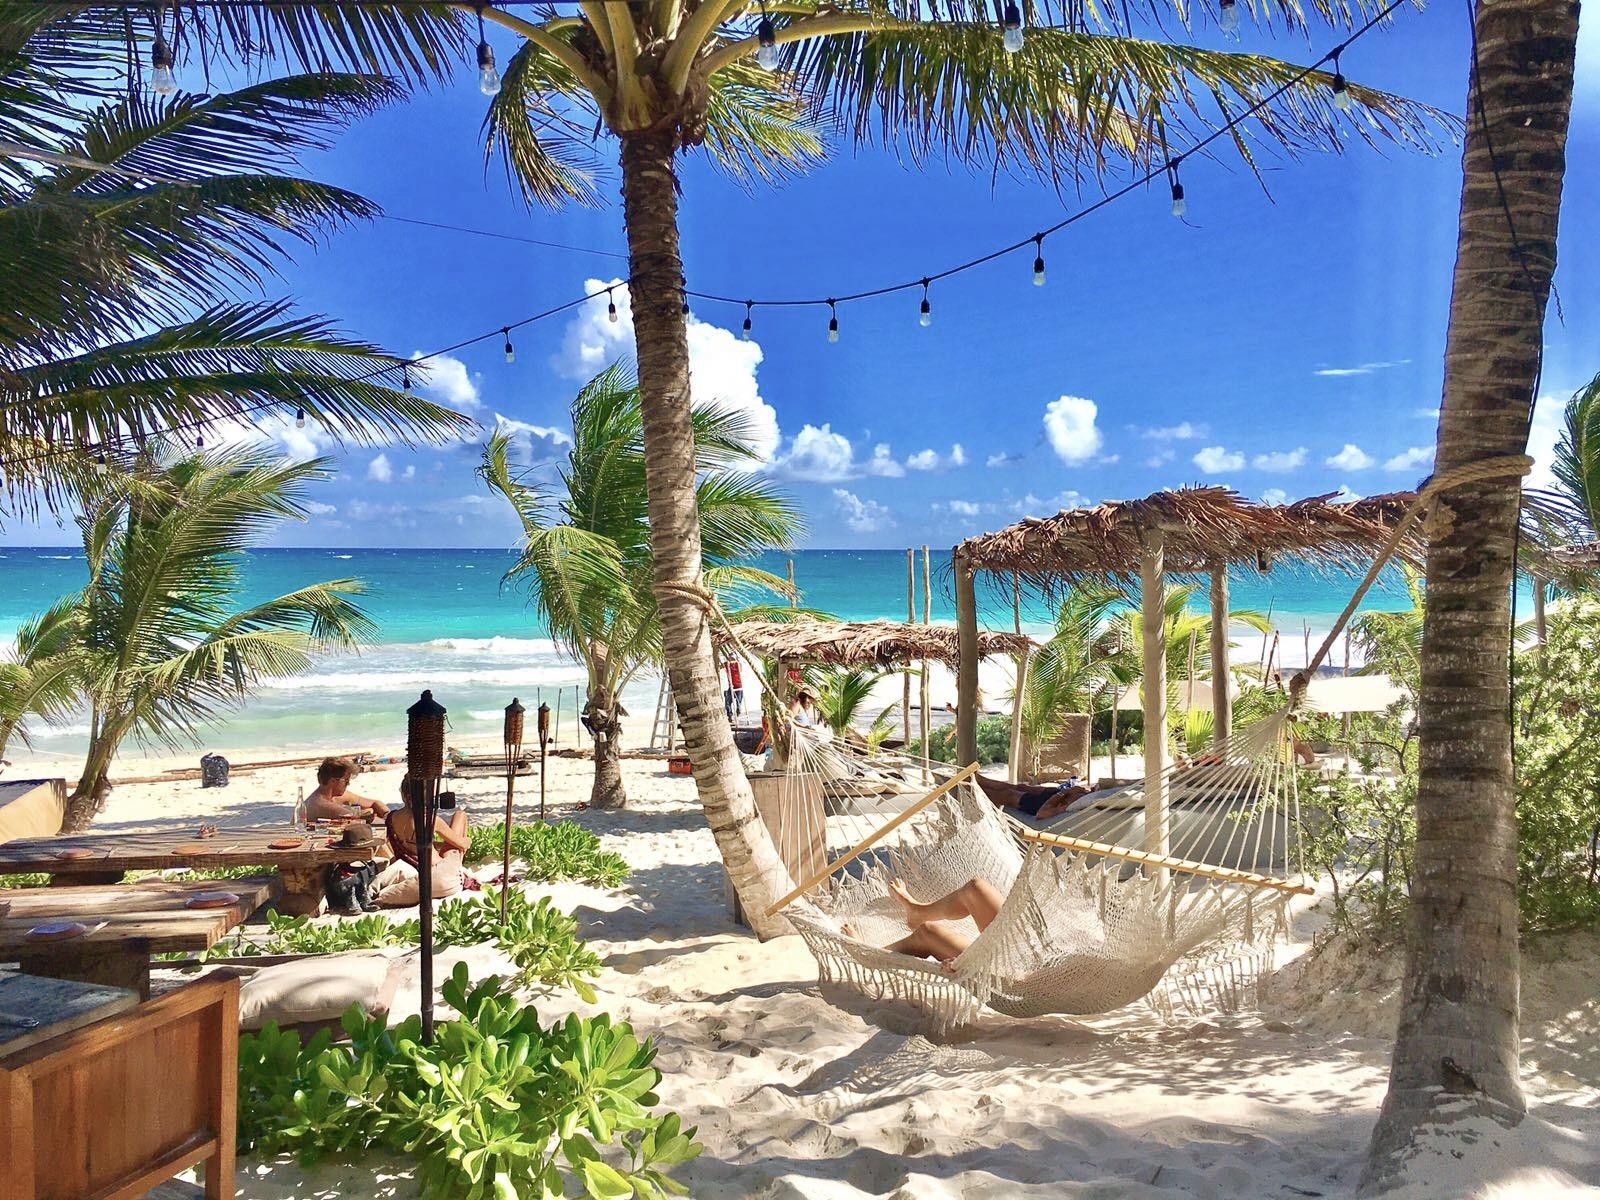 Andrea Emmerich, Tulum Beach, Mexico - 3 Days*